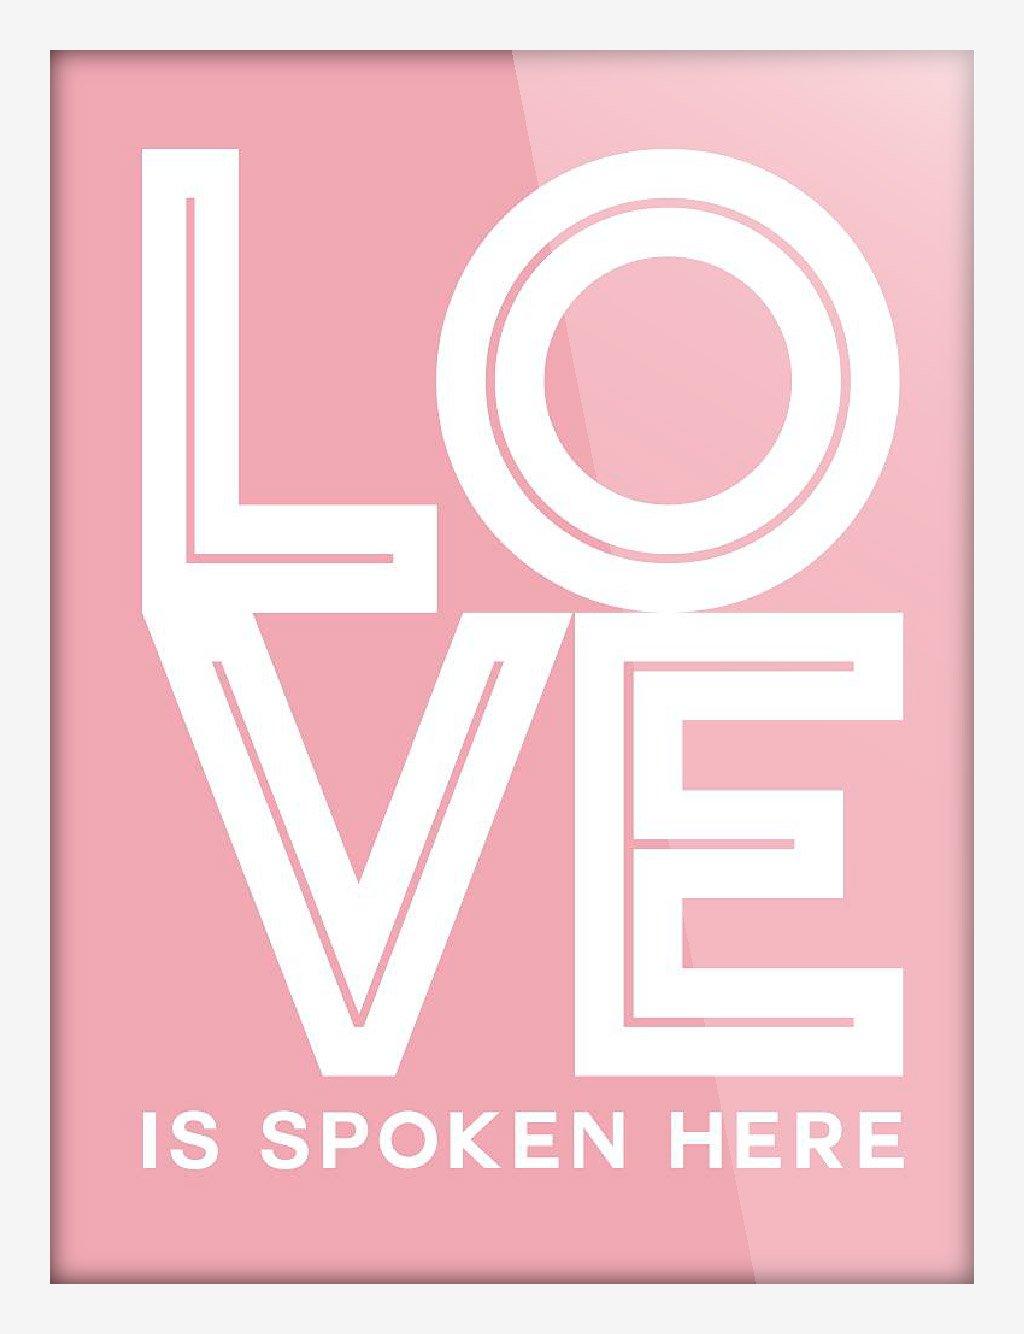 light art 轻艺术 图说语录 爱的密语 北欧简约英文字母图片海报定制图片